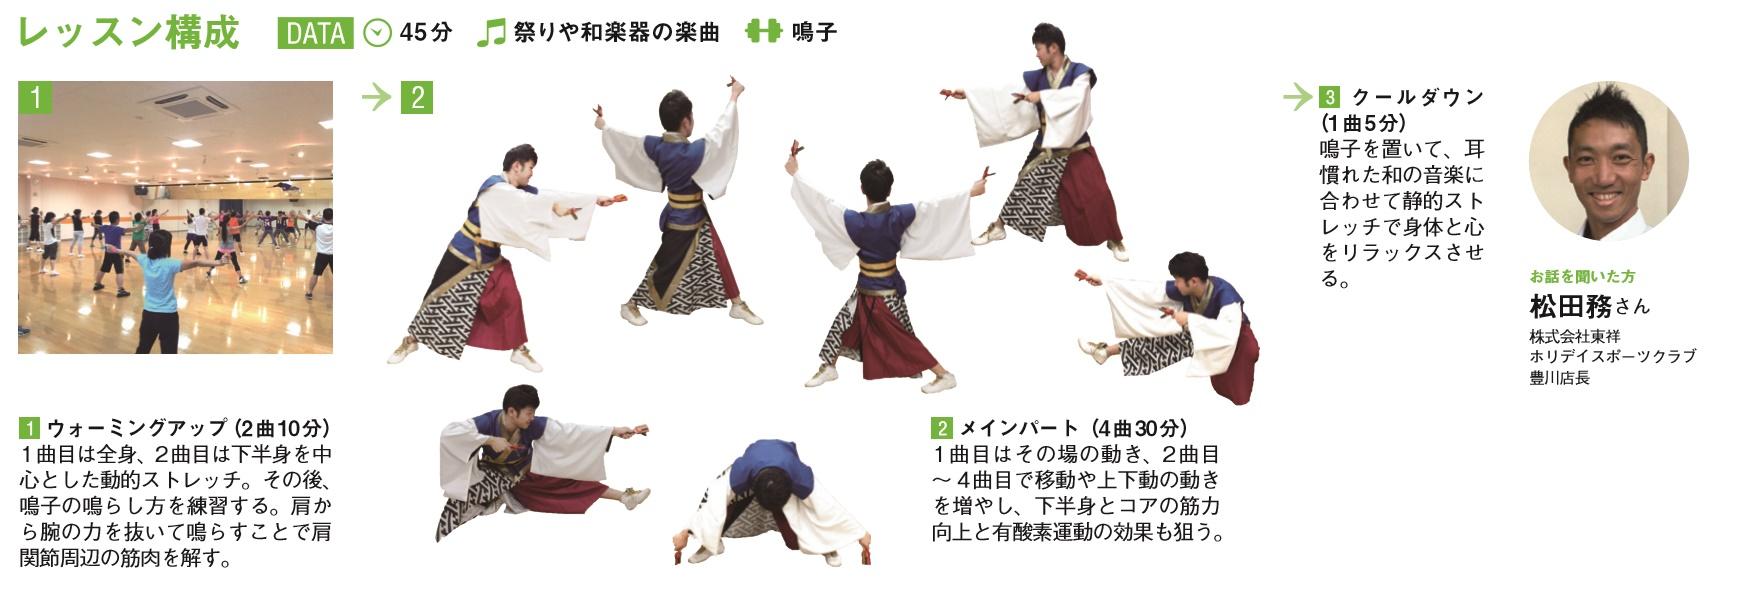 yosakoi